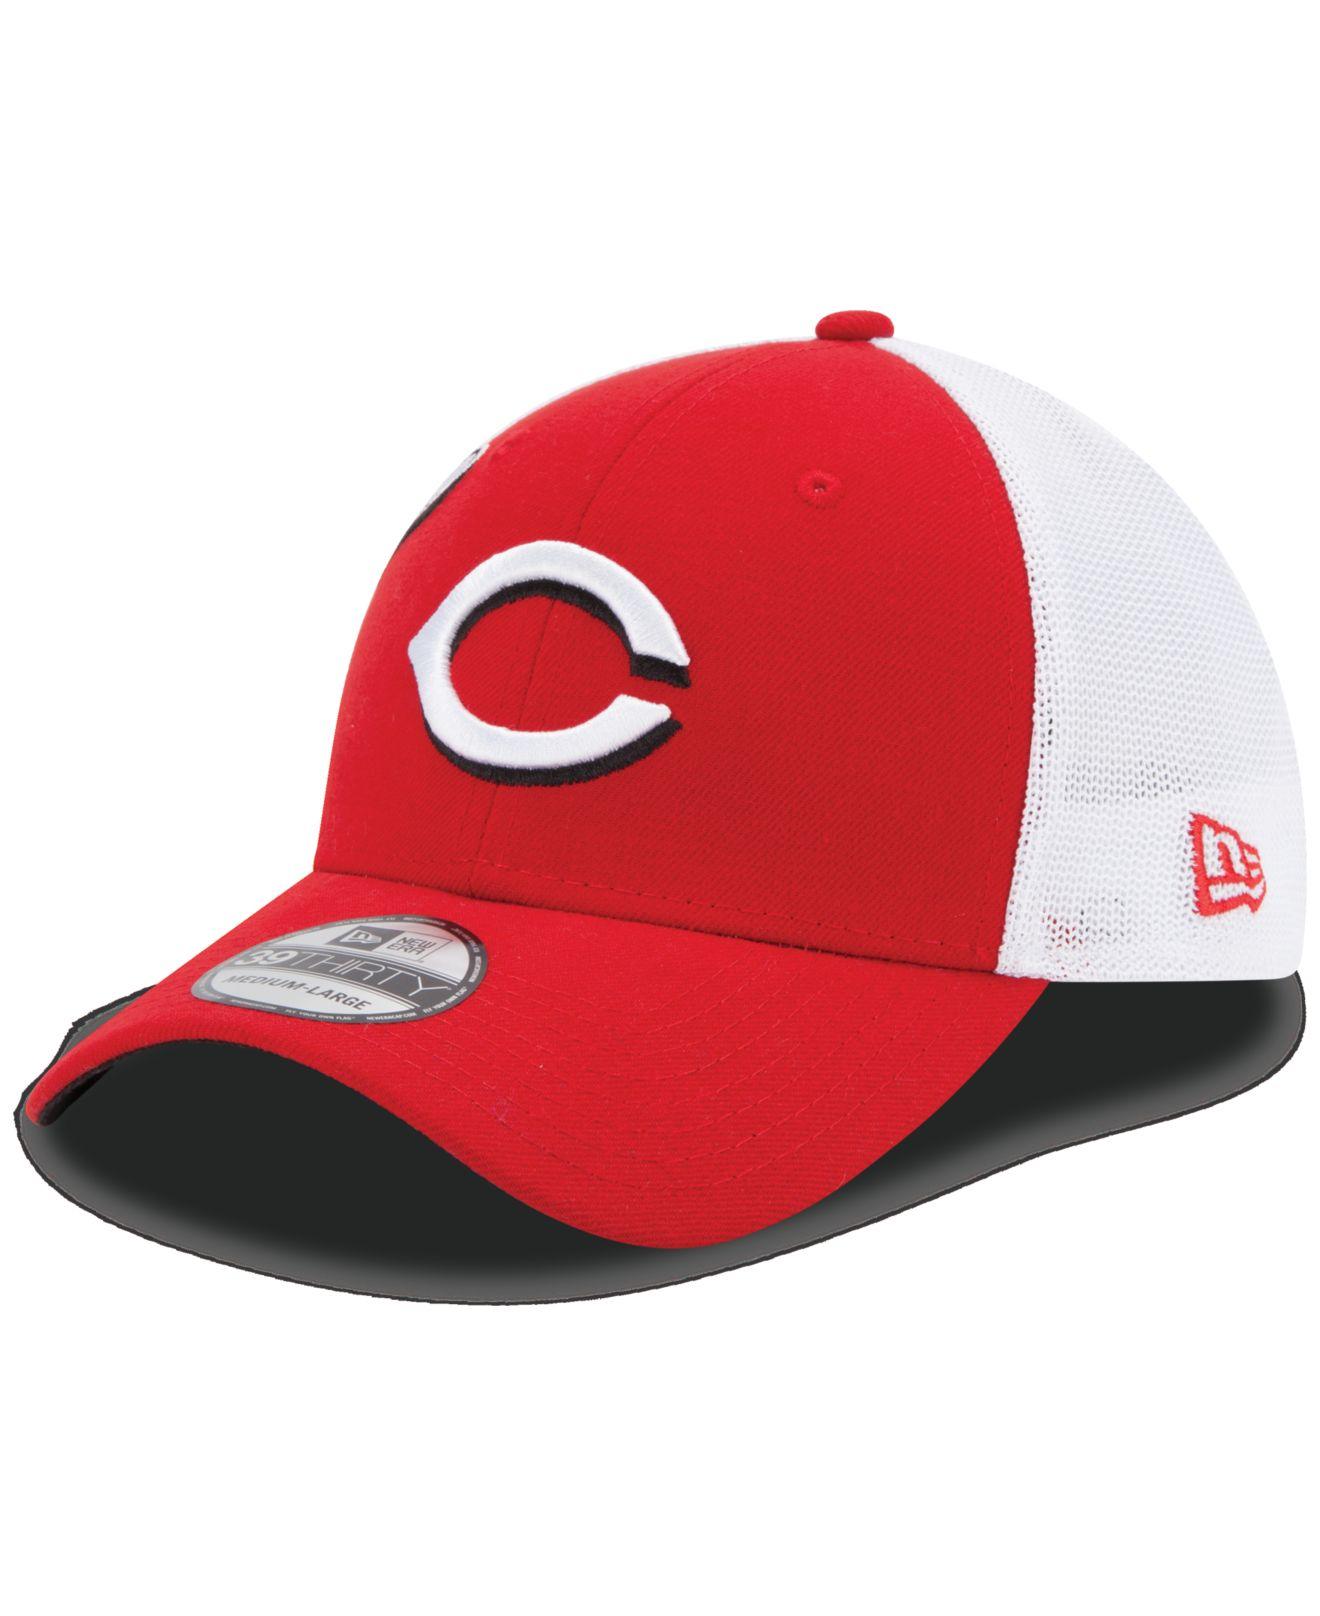 new product 2ee1e 976e5 ... france american needle new school mlb trucker hat lyst ktz cincinnati  reds double mesh 39thirty cap